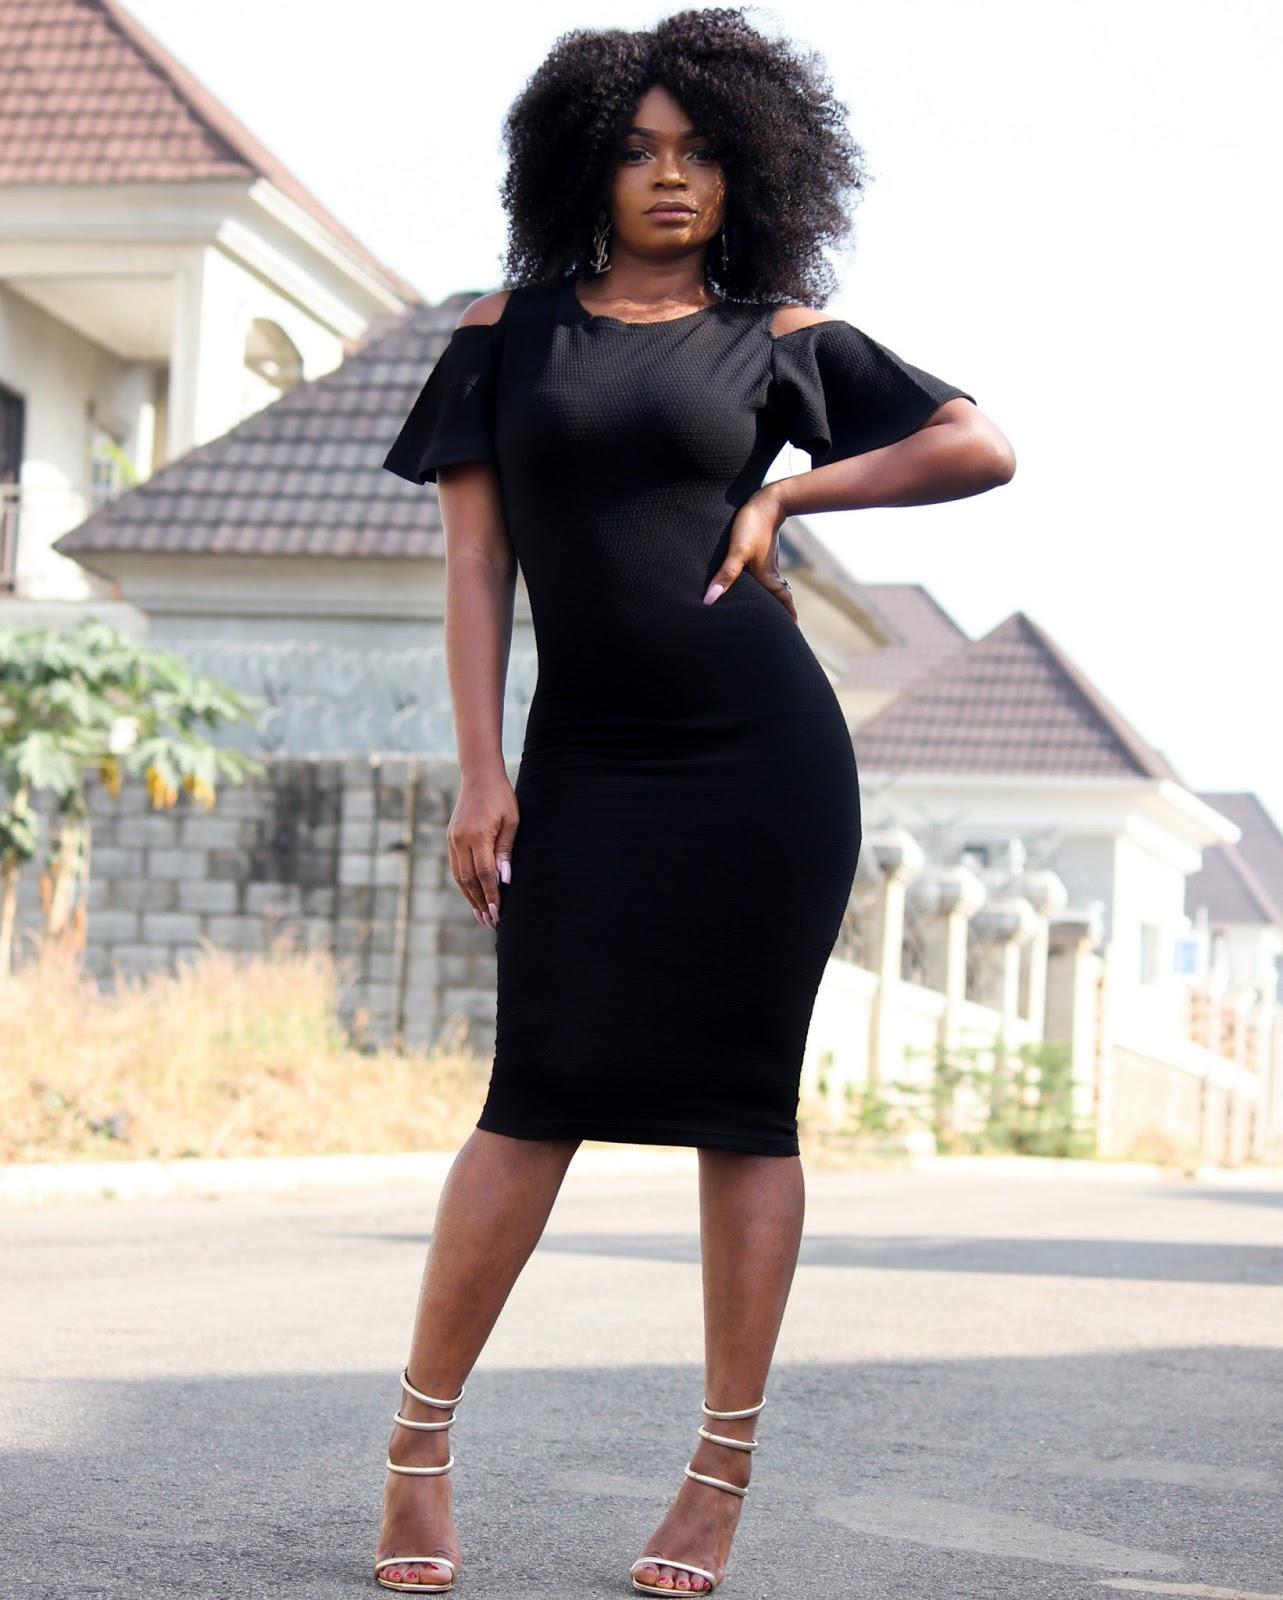 BLACK COLD SHOULDER DRESS - Jumia Black Cold Shoulder Dress with Public Desire Sandals